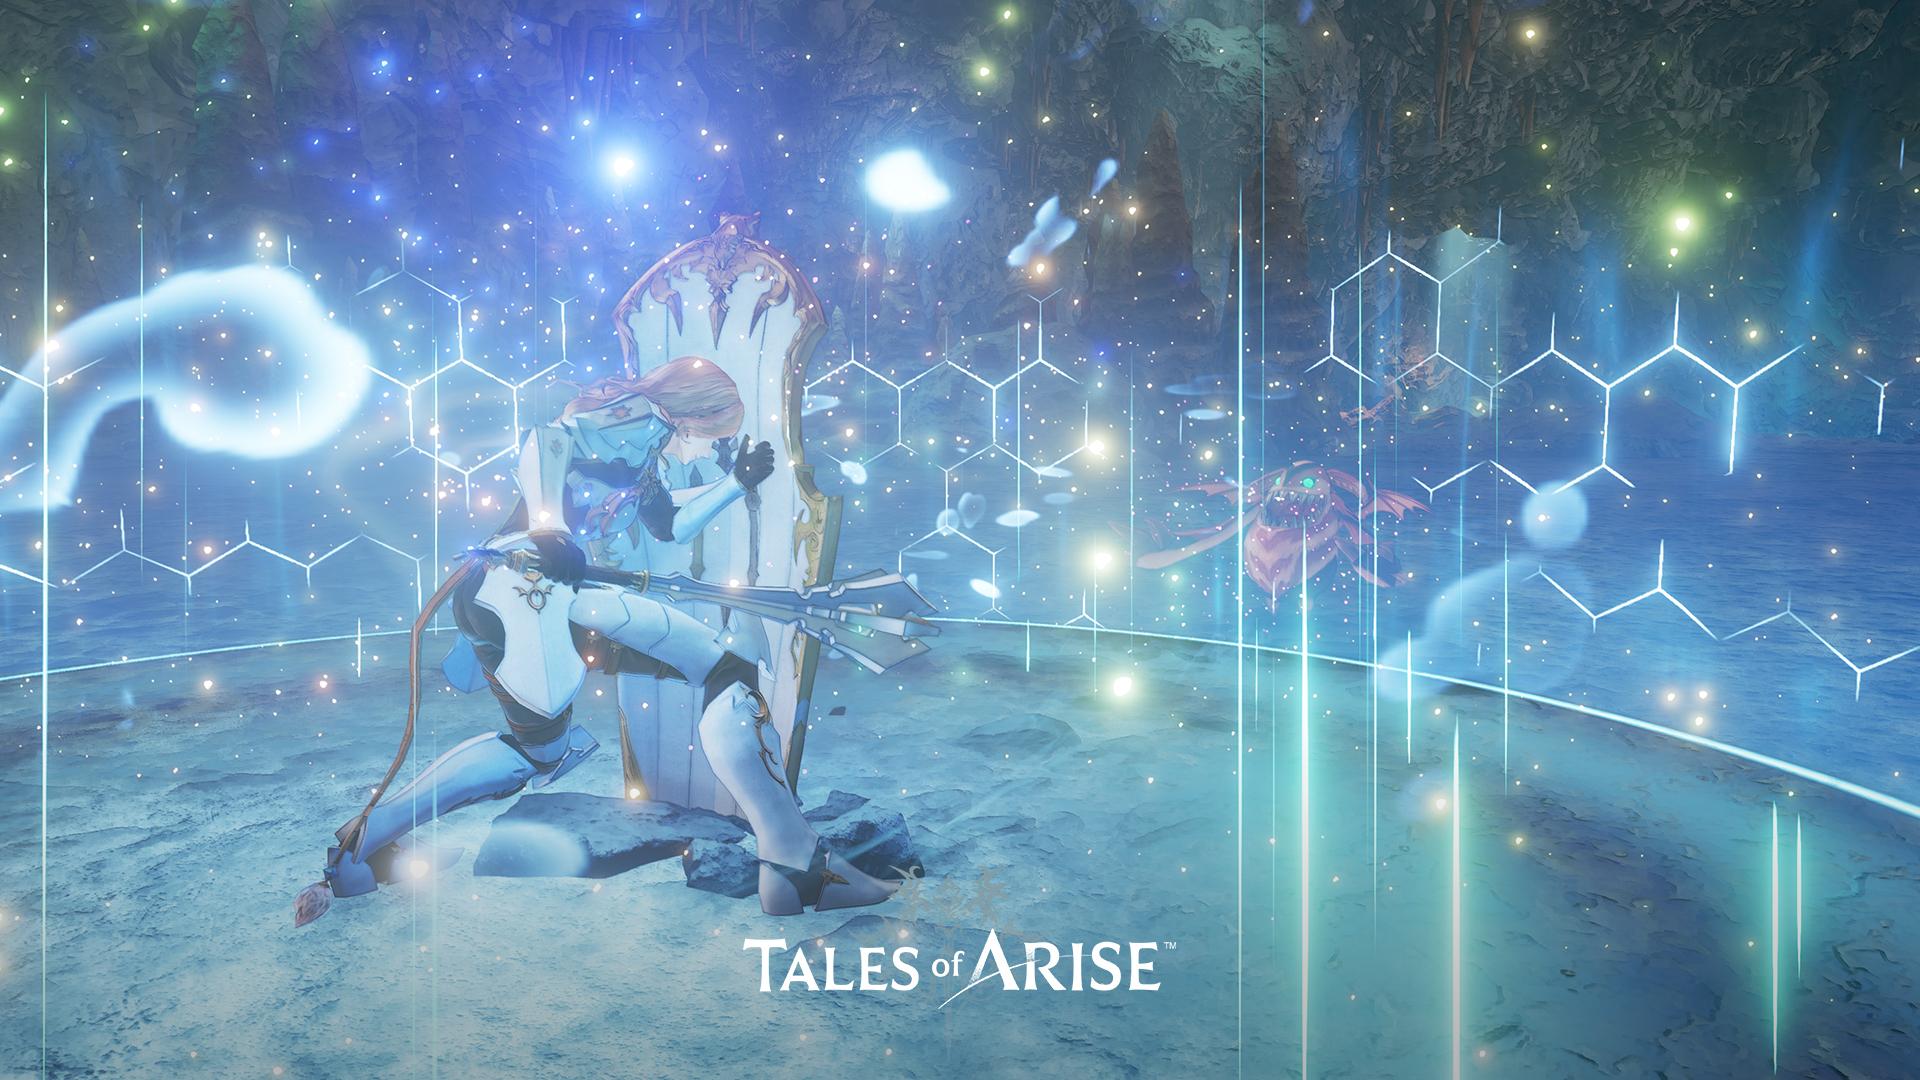 tales of arise kisara preview 3